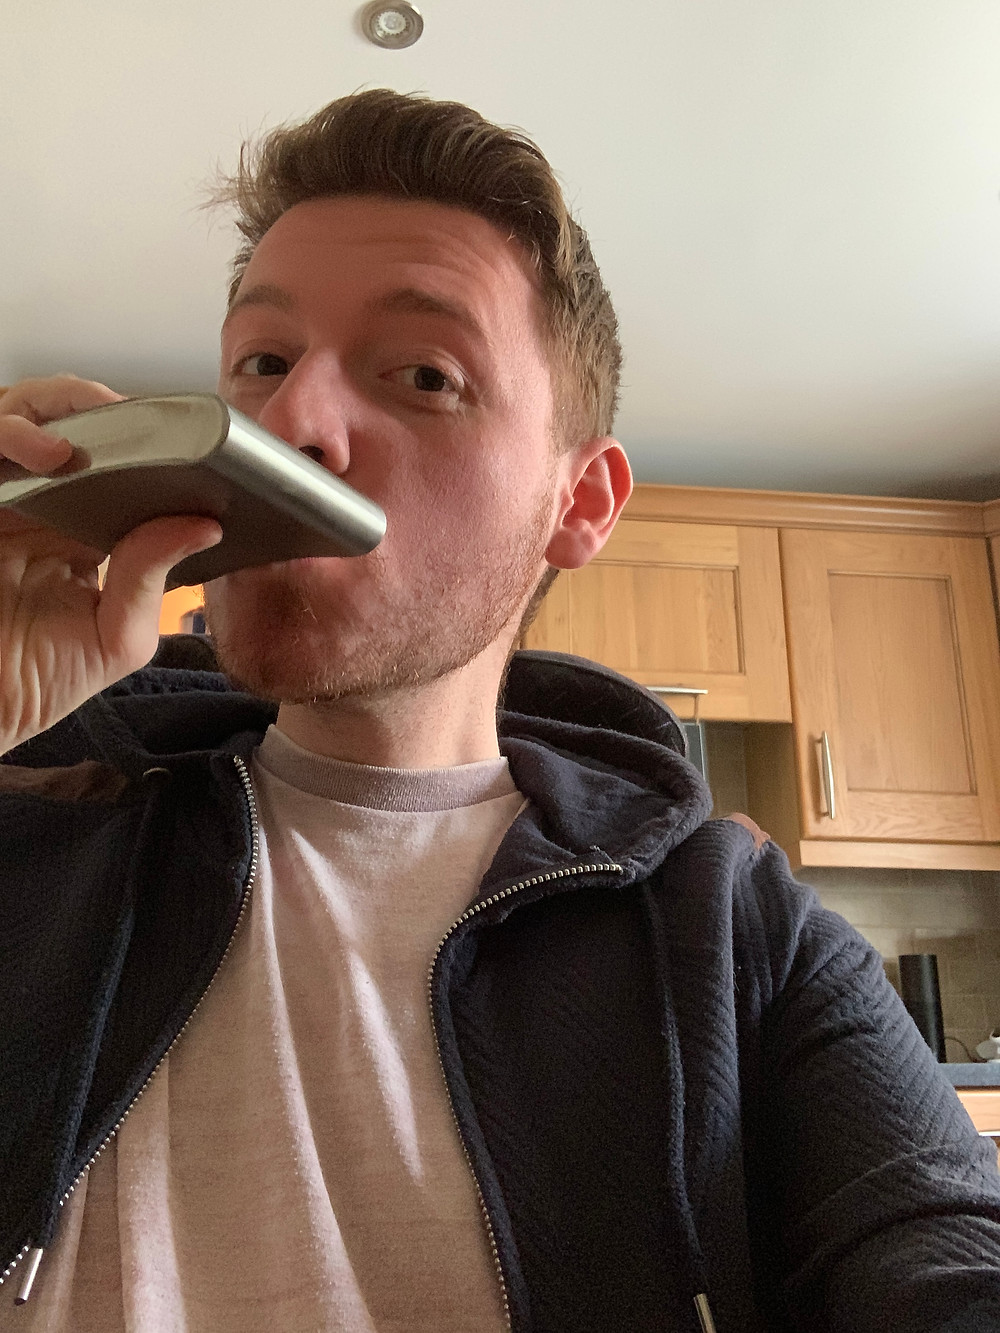 Selfie of Ross swigging a drink from a hip flask